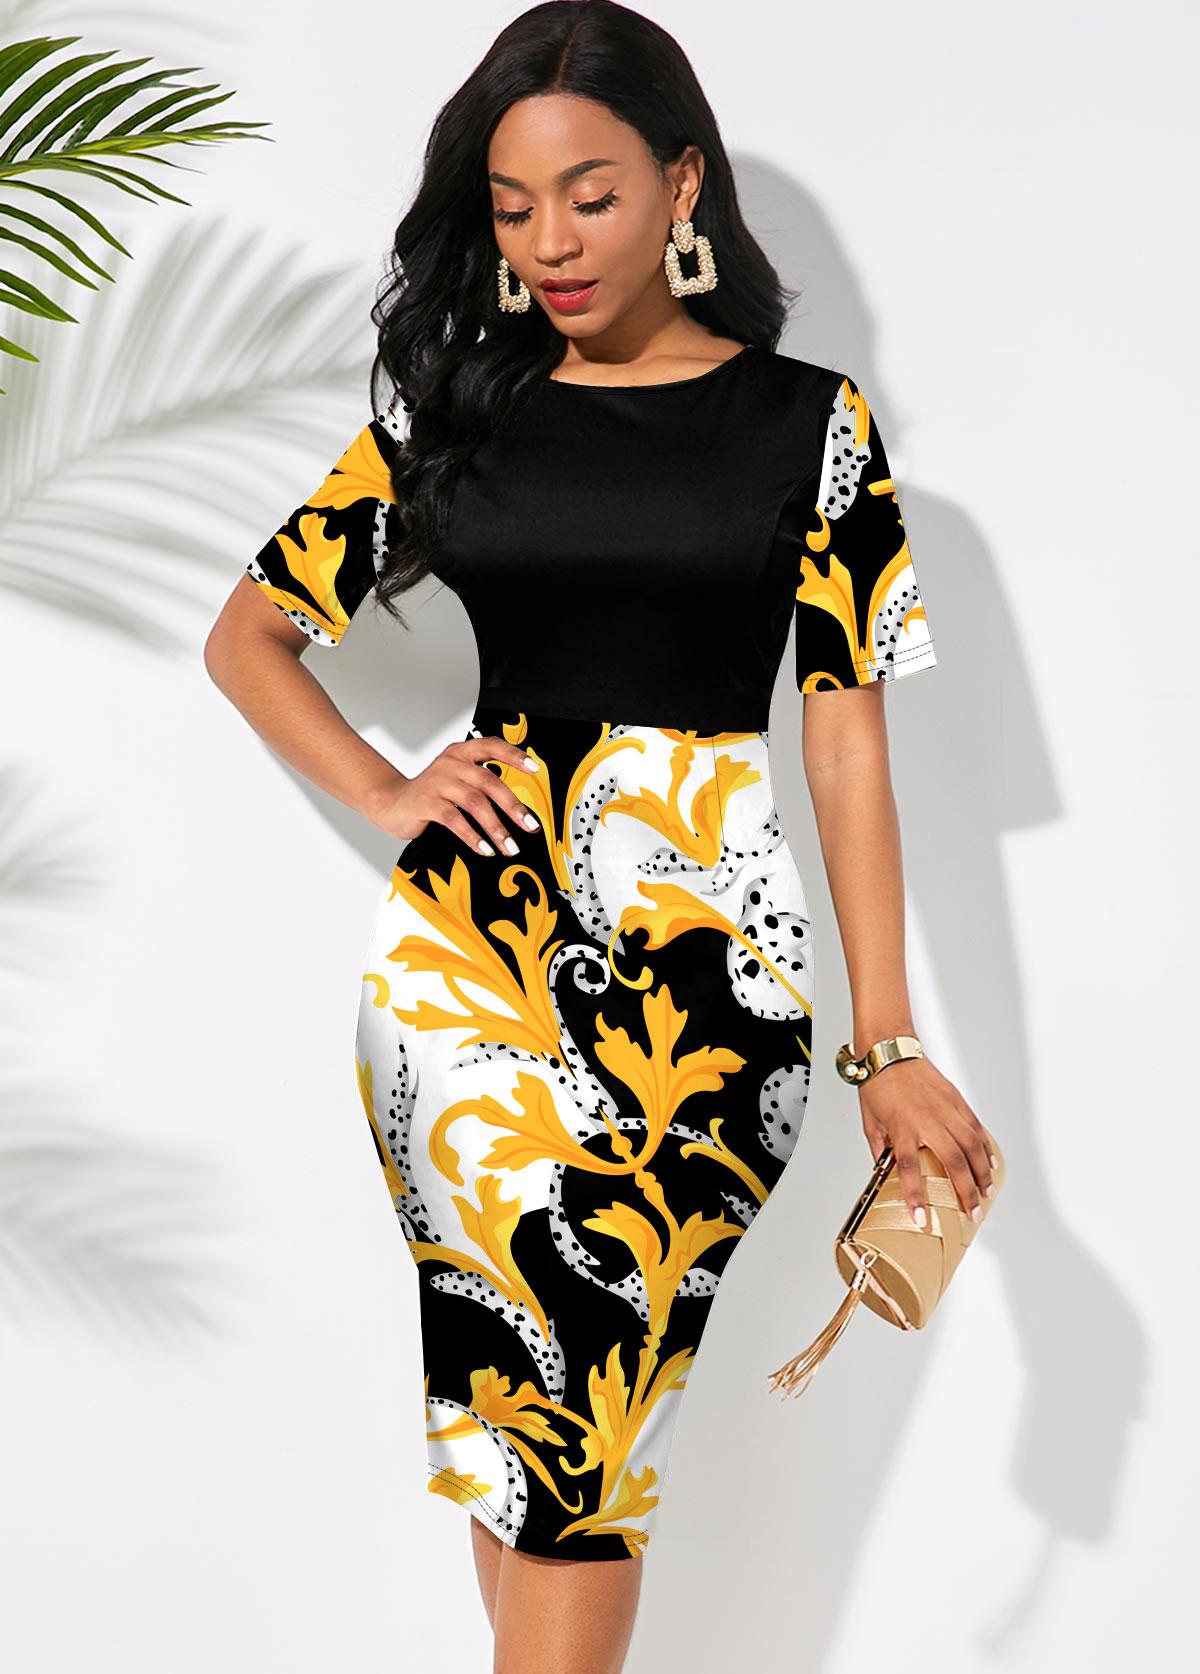 ROTITA Floral Print Short Sleeve Round Neck Dress